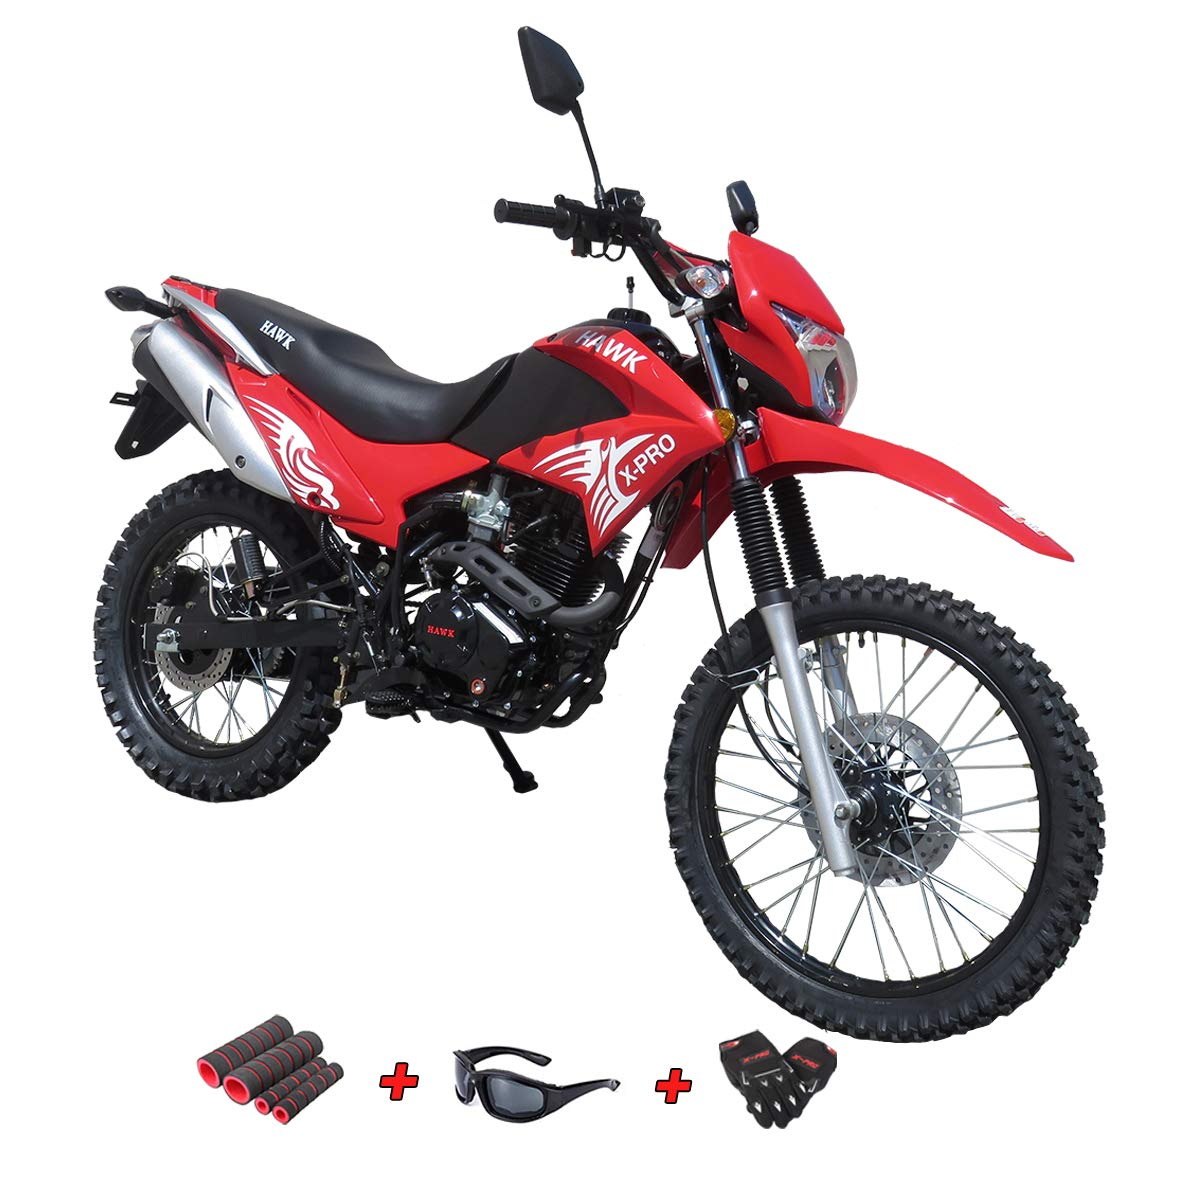 Black X-Pro 250 Dirt Bike Motorcycle Bike Hawk 250 Dirt Bike Enduro Street Bike Motorcycle Bike with Gloves Sunglasses and Handgrip